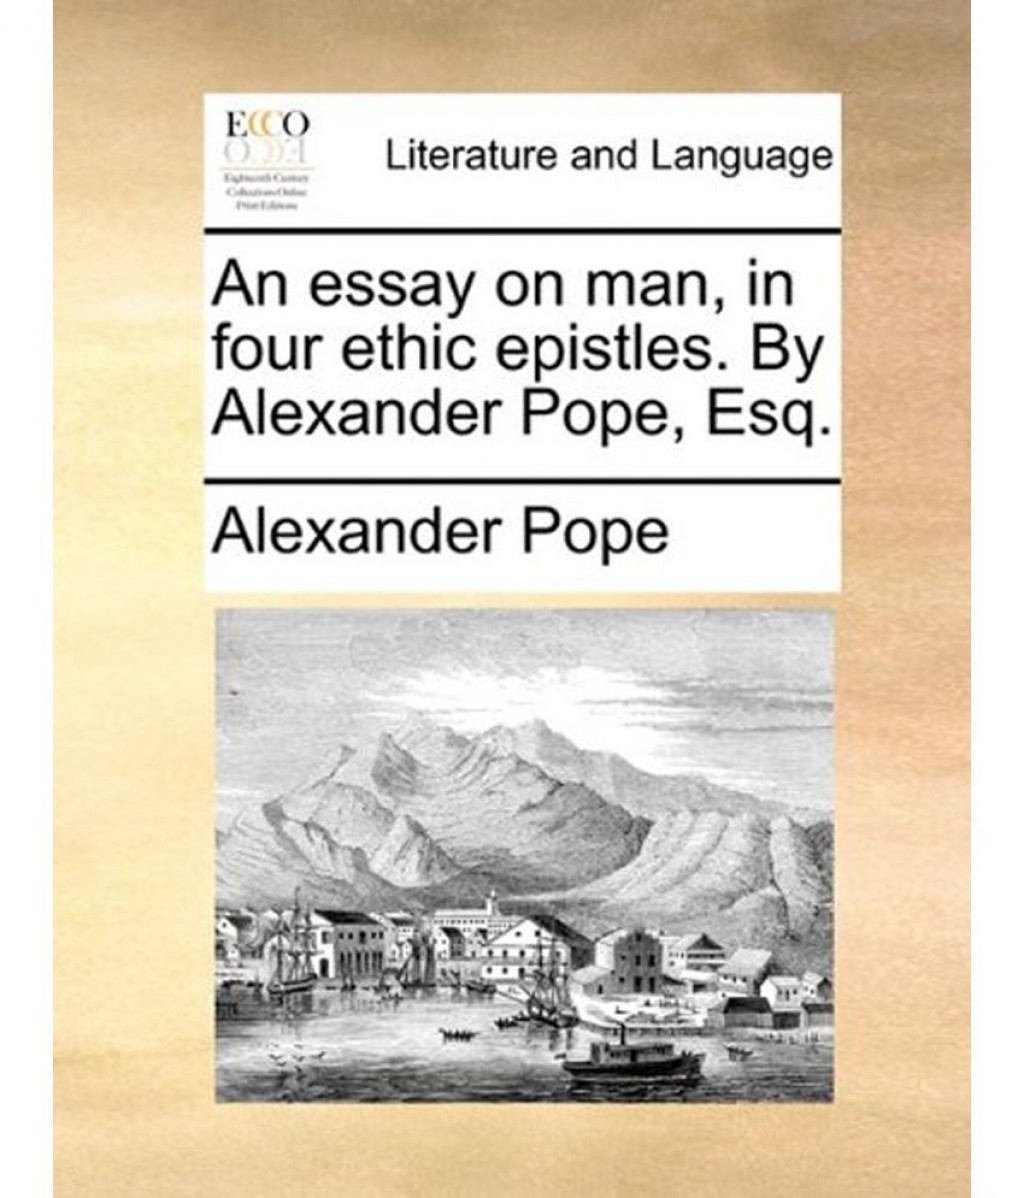 Analysis of an essay on man